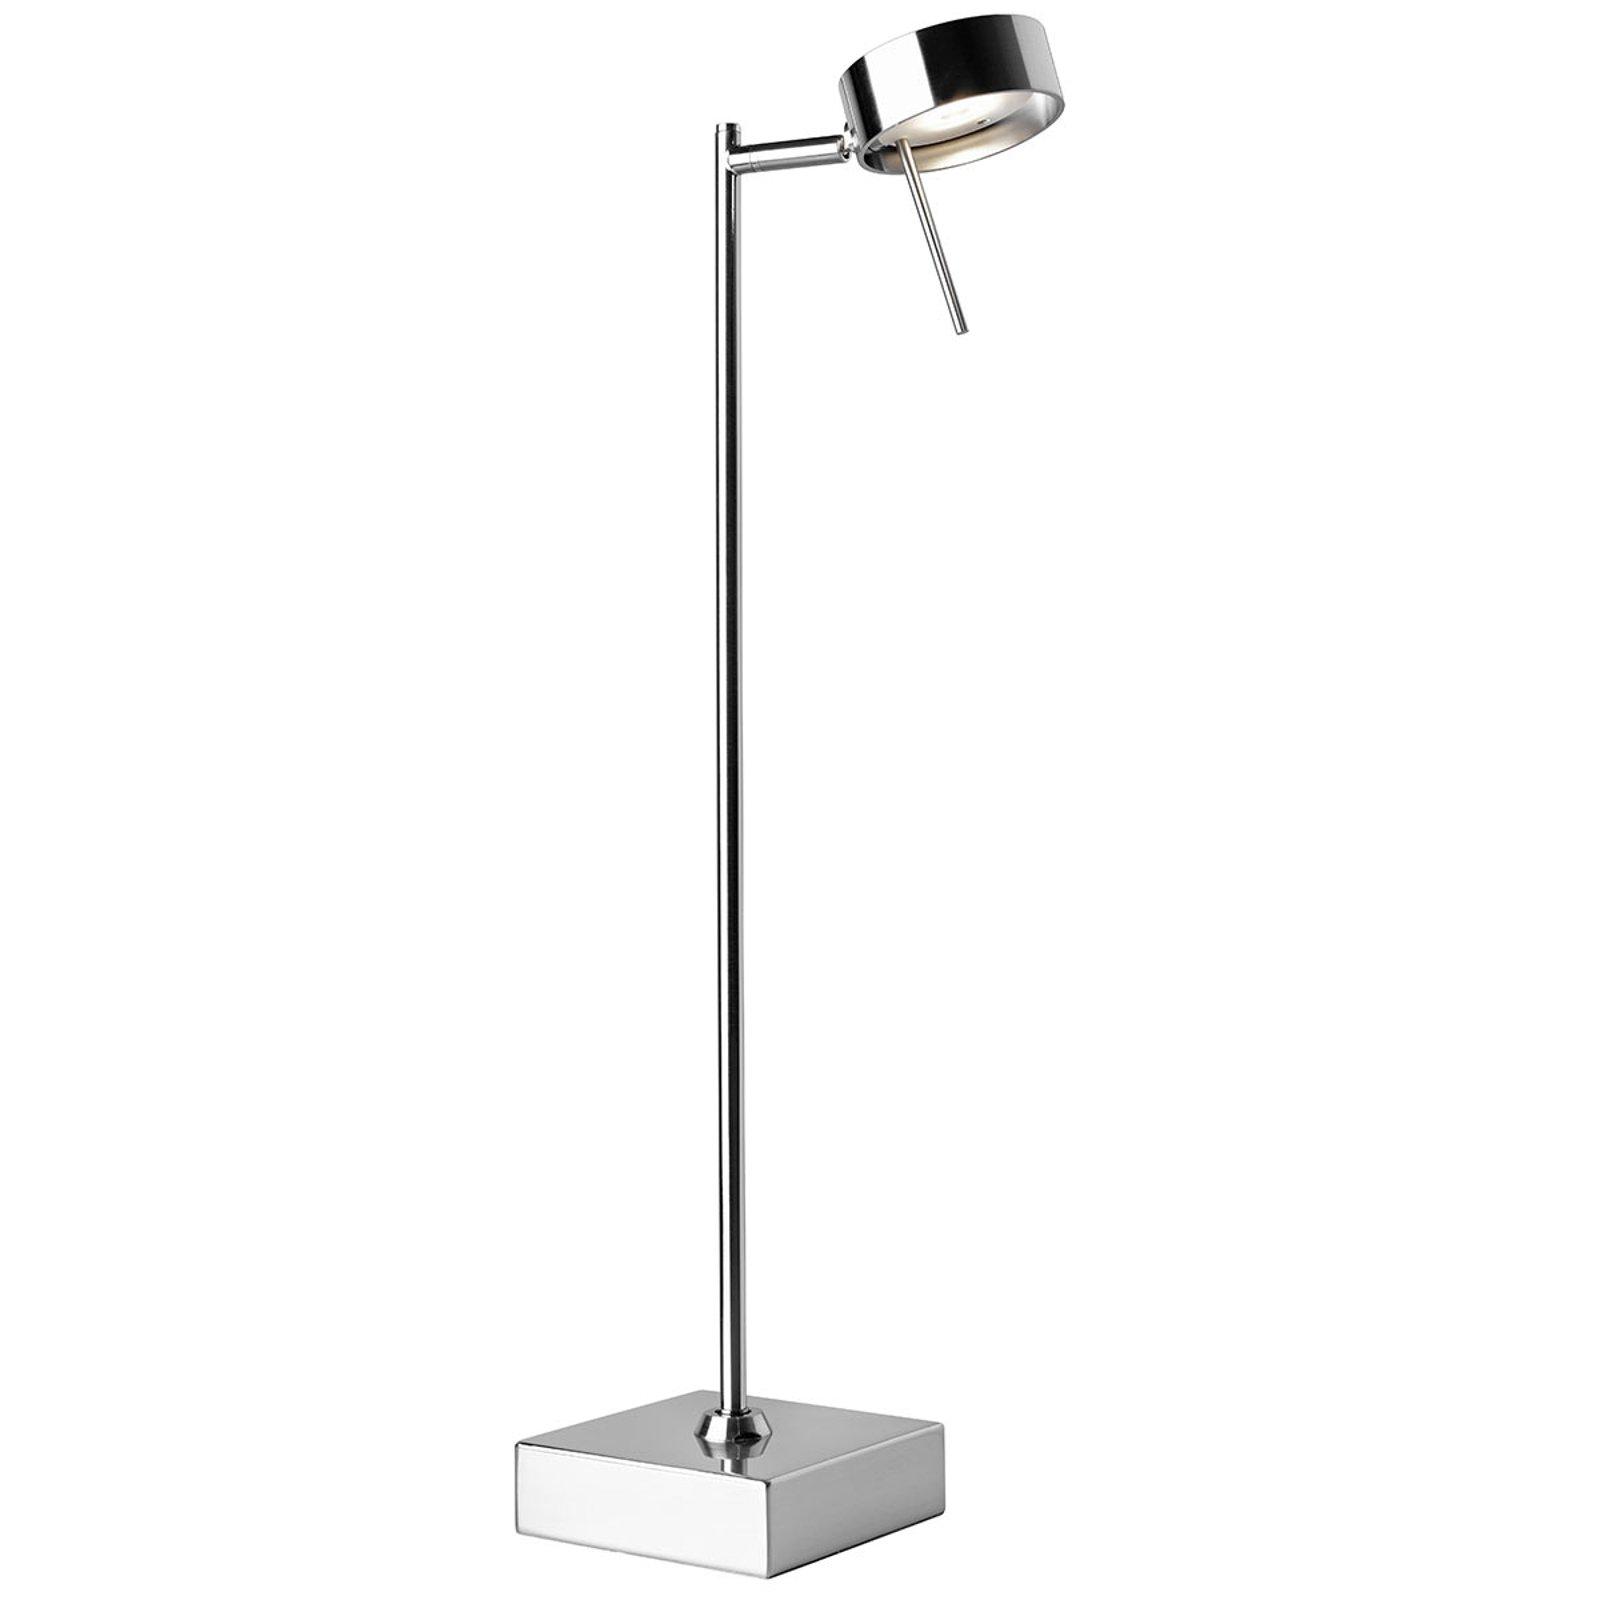 LED-bordlampe Bling, justerbar, krom